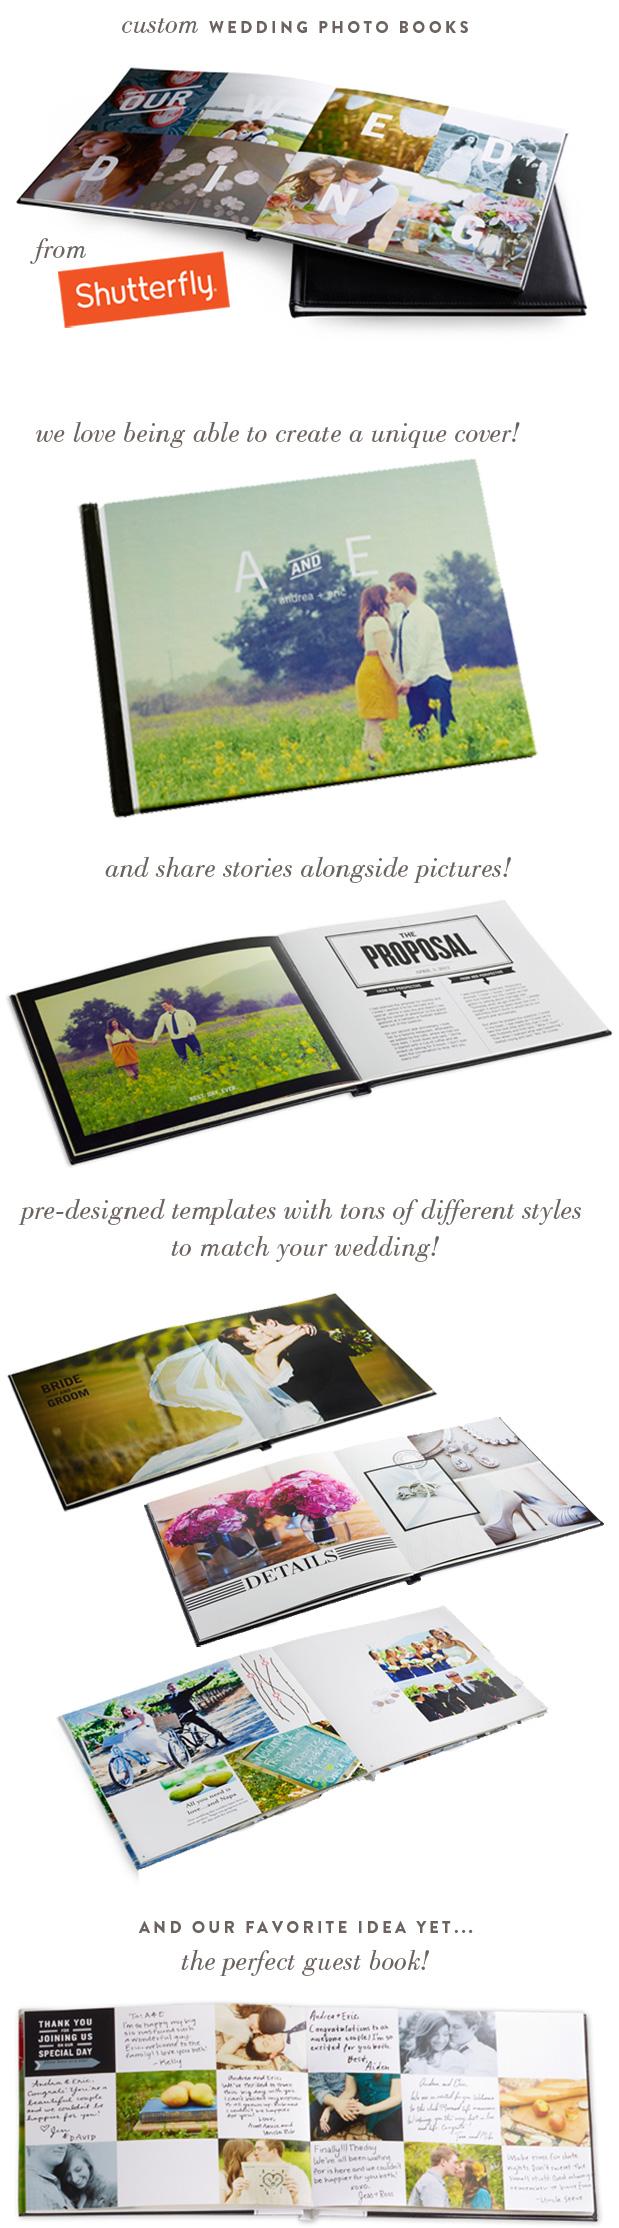 Wedding Blog Shutterfly Wedding Photo Books